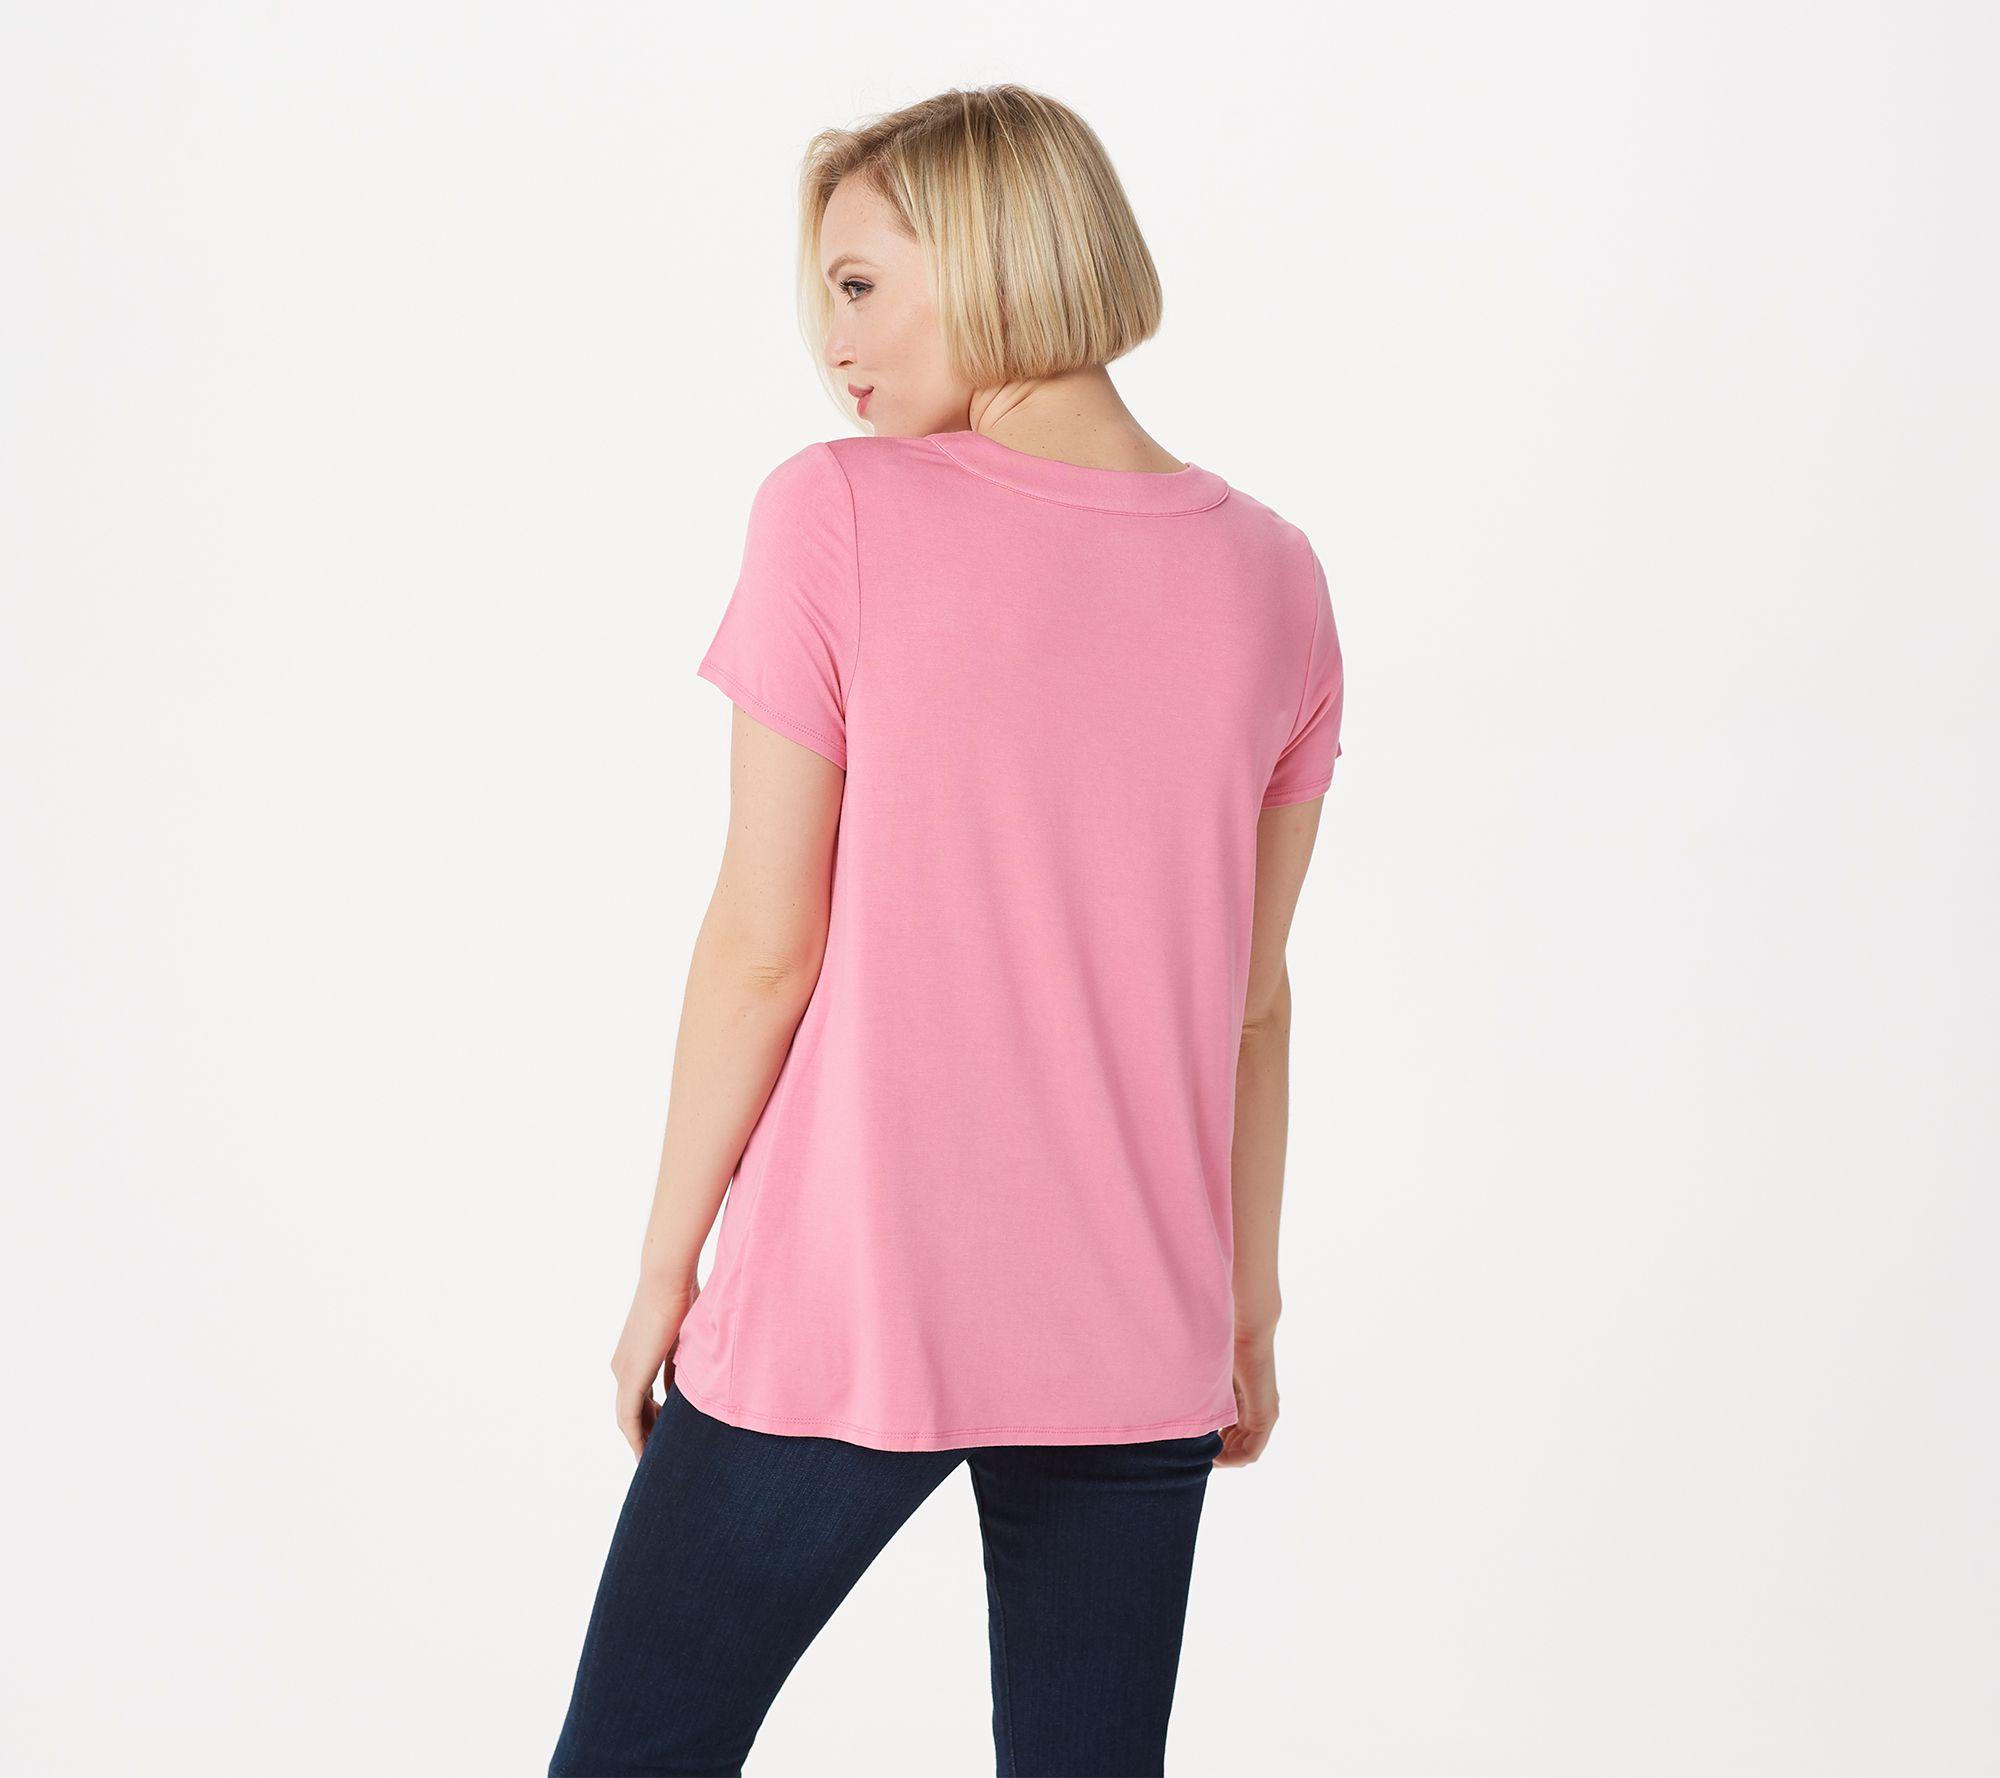 4017b58cba702 Laurie Felt Short Sleeve V-Neck T-Shirt - Page 1 — QVC.com